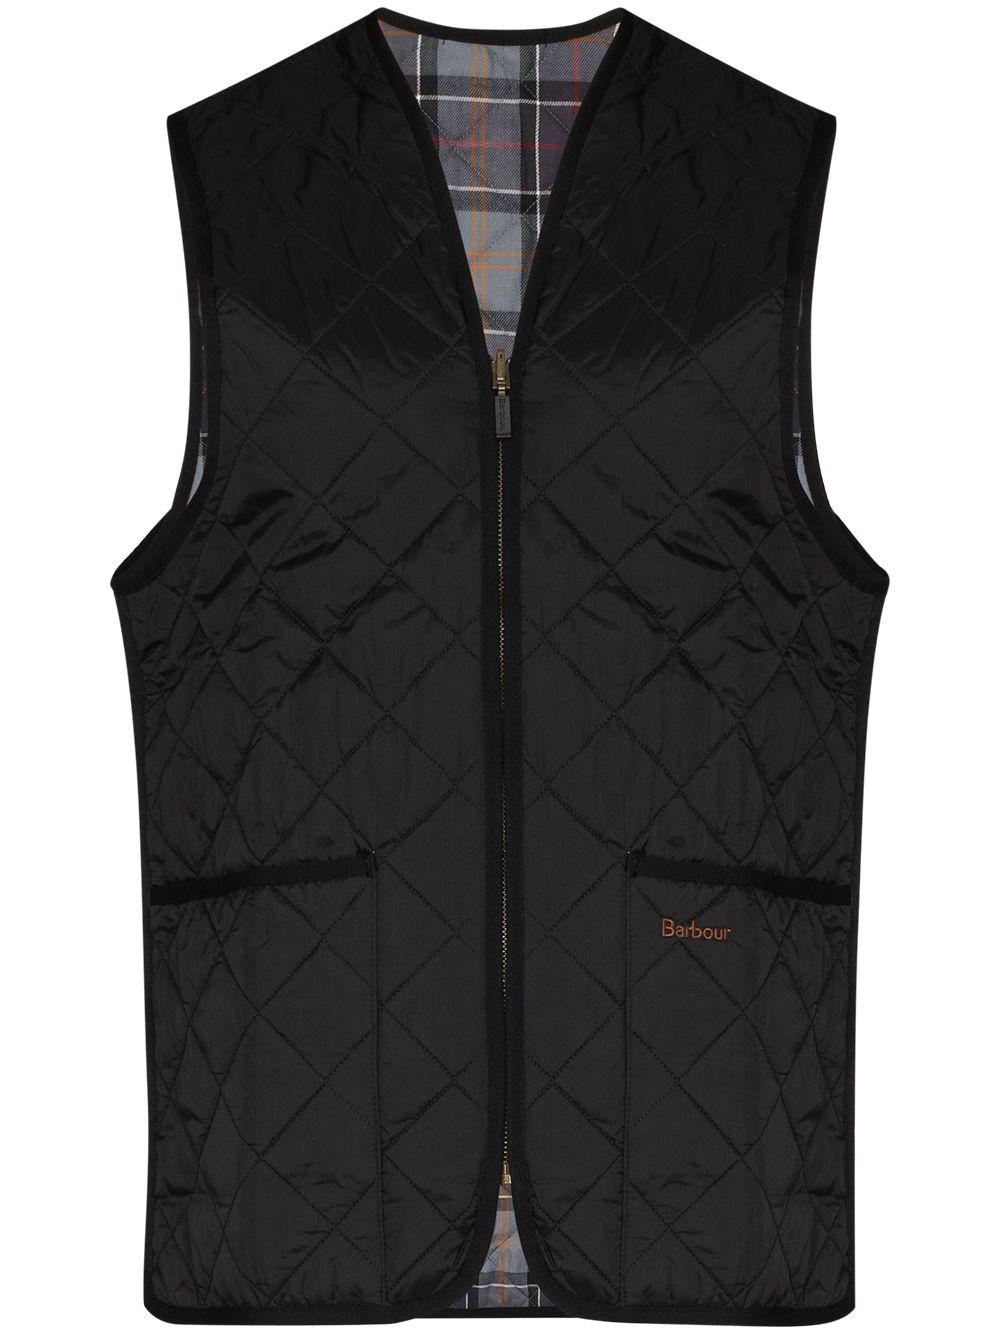 reversible weistcoat man black in cotton BARBOUR | Jackets | MLI0001BK91